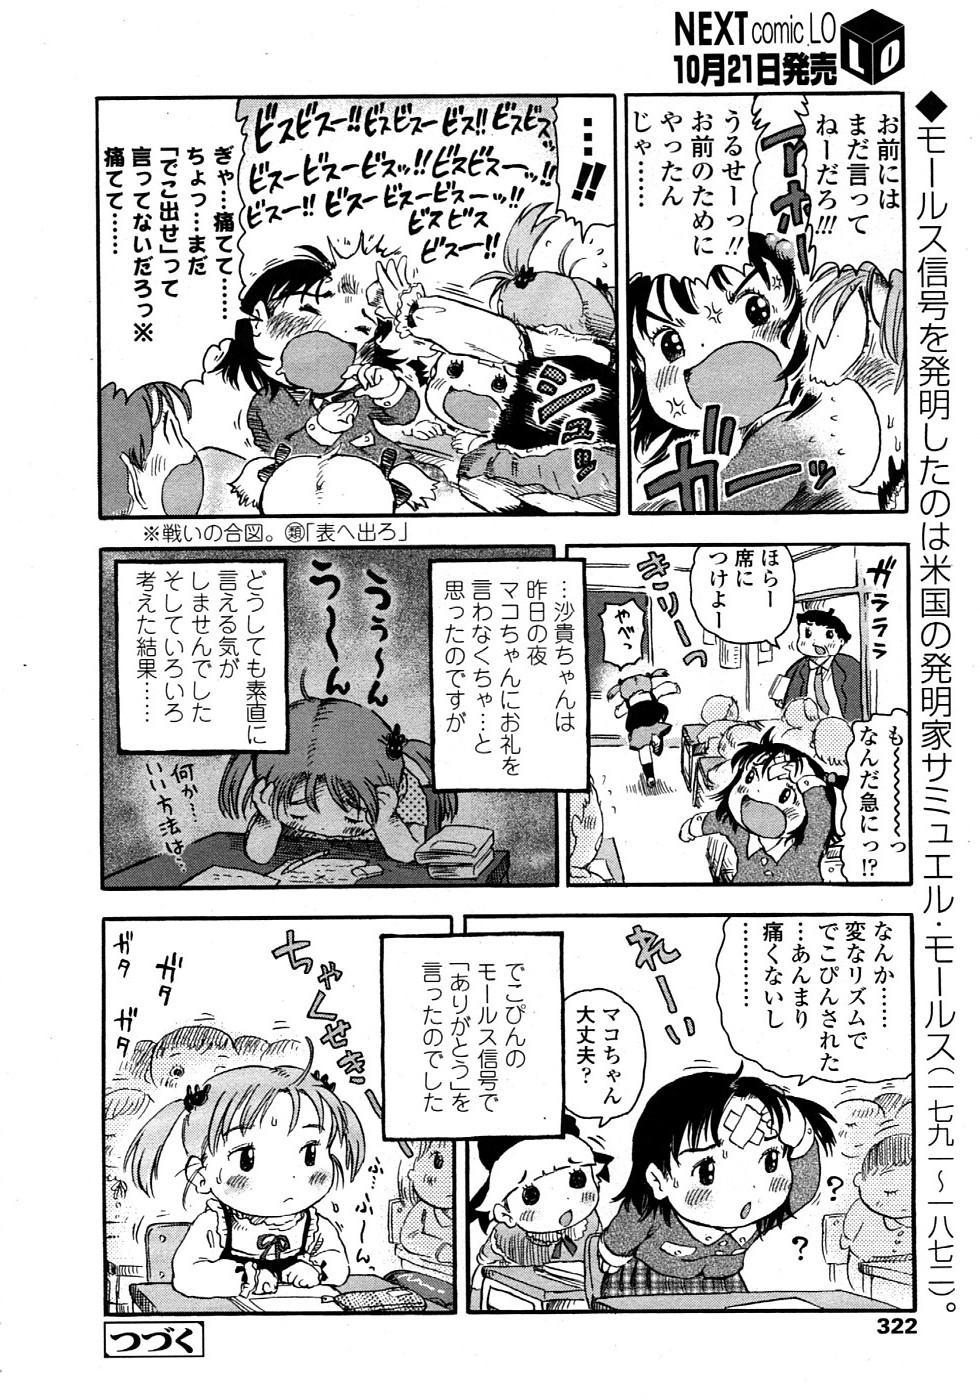 Comic LO 2008-11 Vol. 56 321